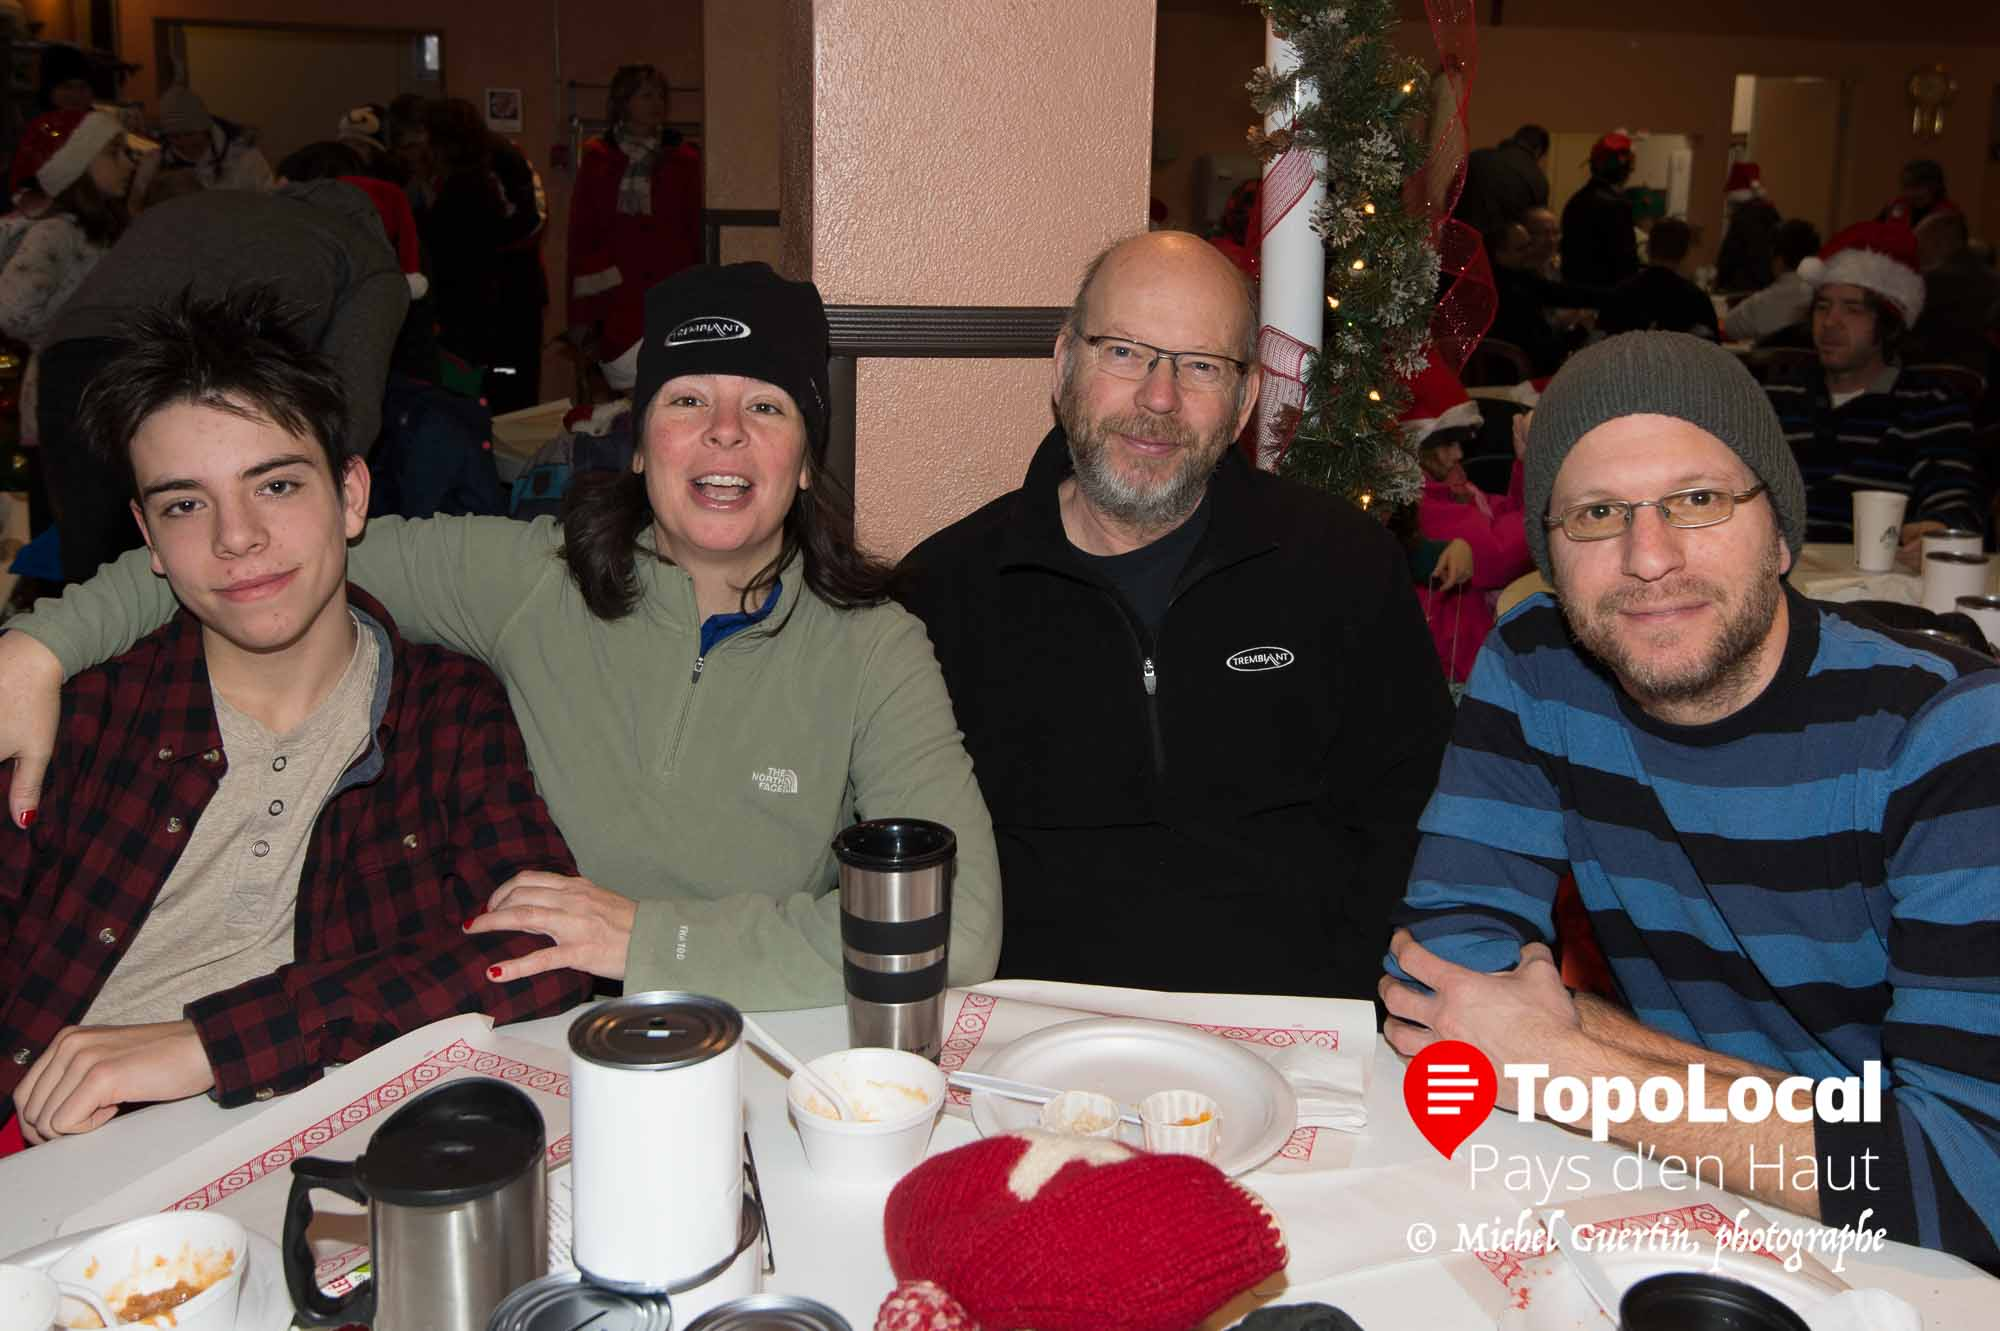 20161210-sainte-adele-guignolee-garde-manger-apys-haut-chevaliers-colomb-13